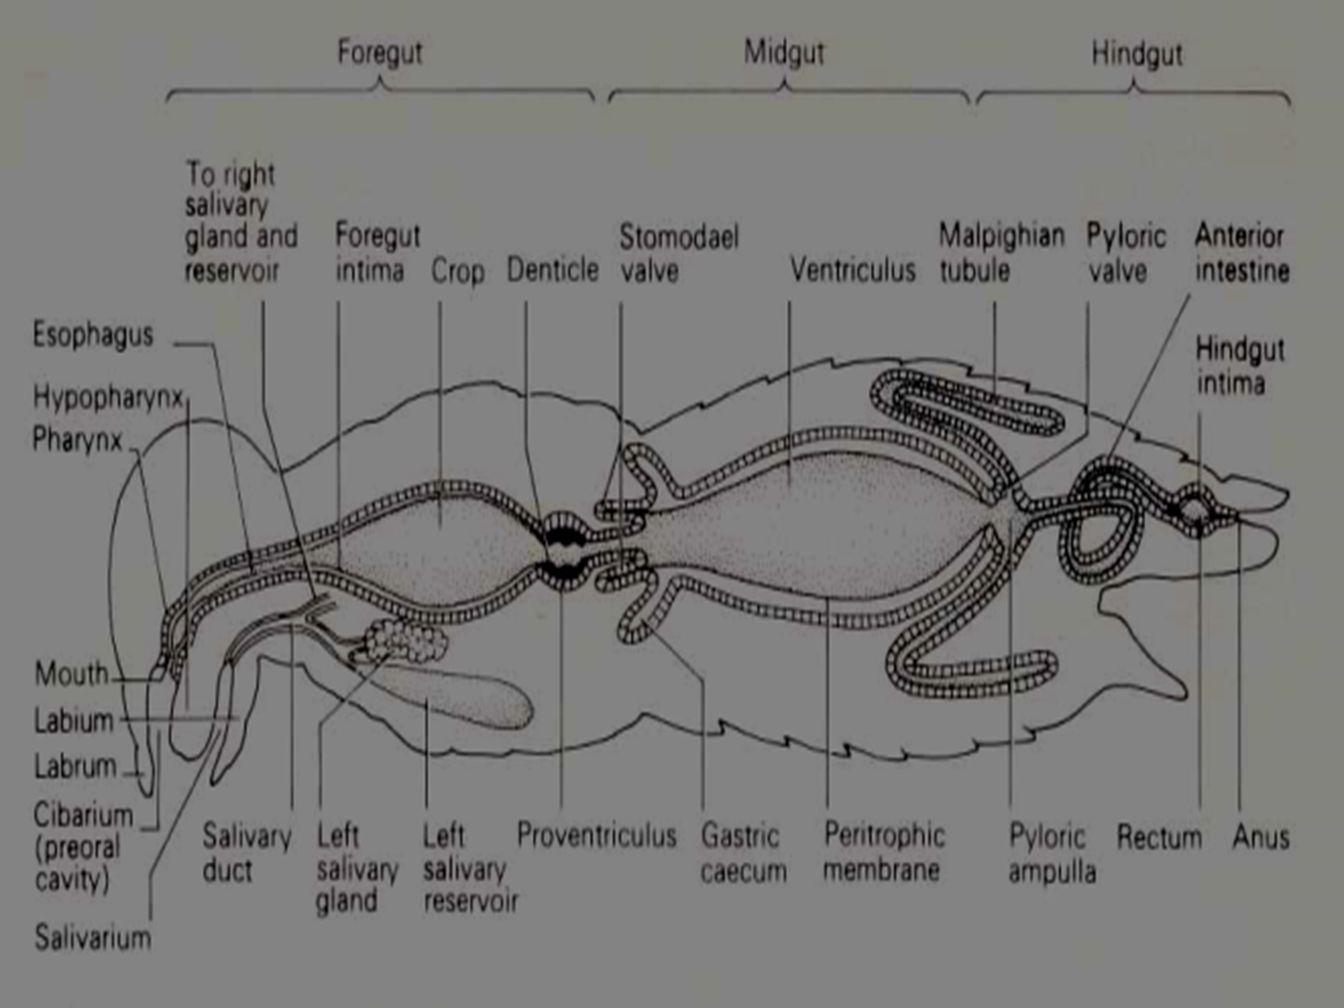 Mekanisme terbang (Elzinga, 1981) 1.Otot longitudinal berkontraksi, tuas scutellar terdorong ke atas.